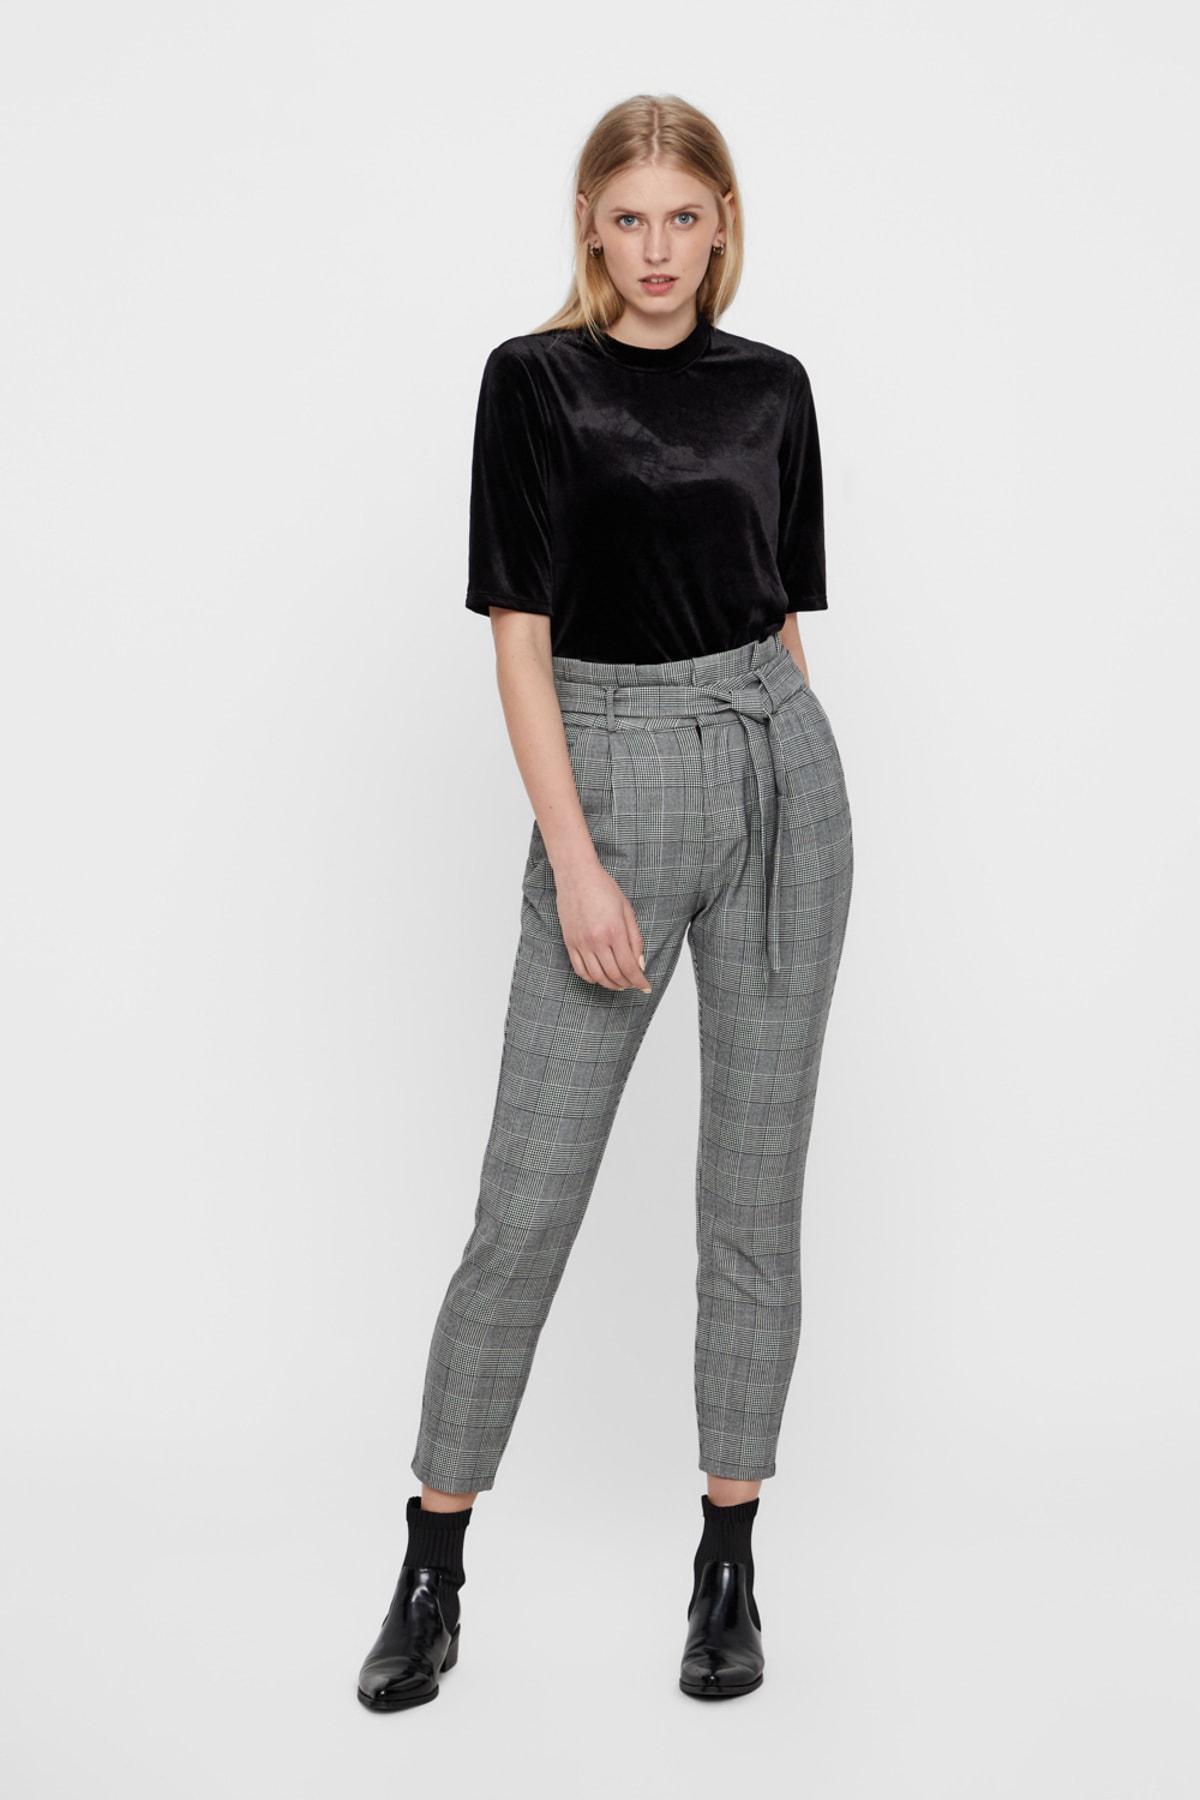 Vero Moda Kadın Gri Kareli Paperbag Bel Kumaş Pantolon 10209834 VMEVA 1